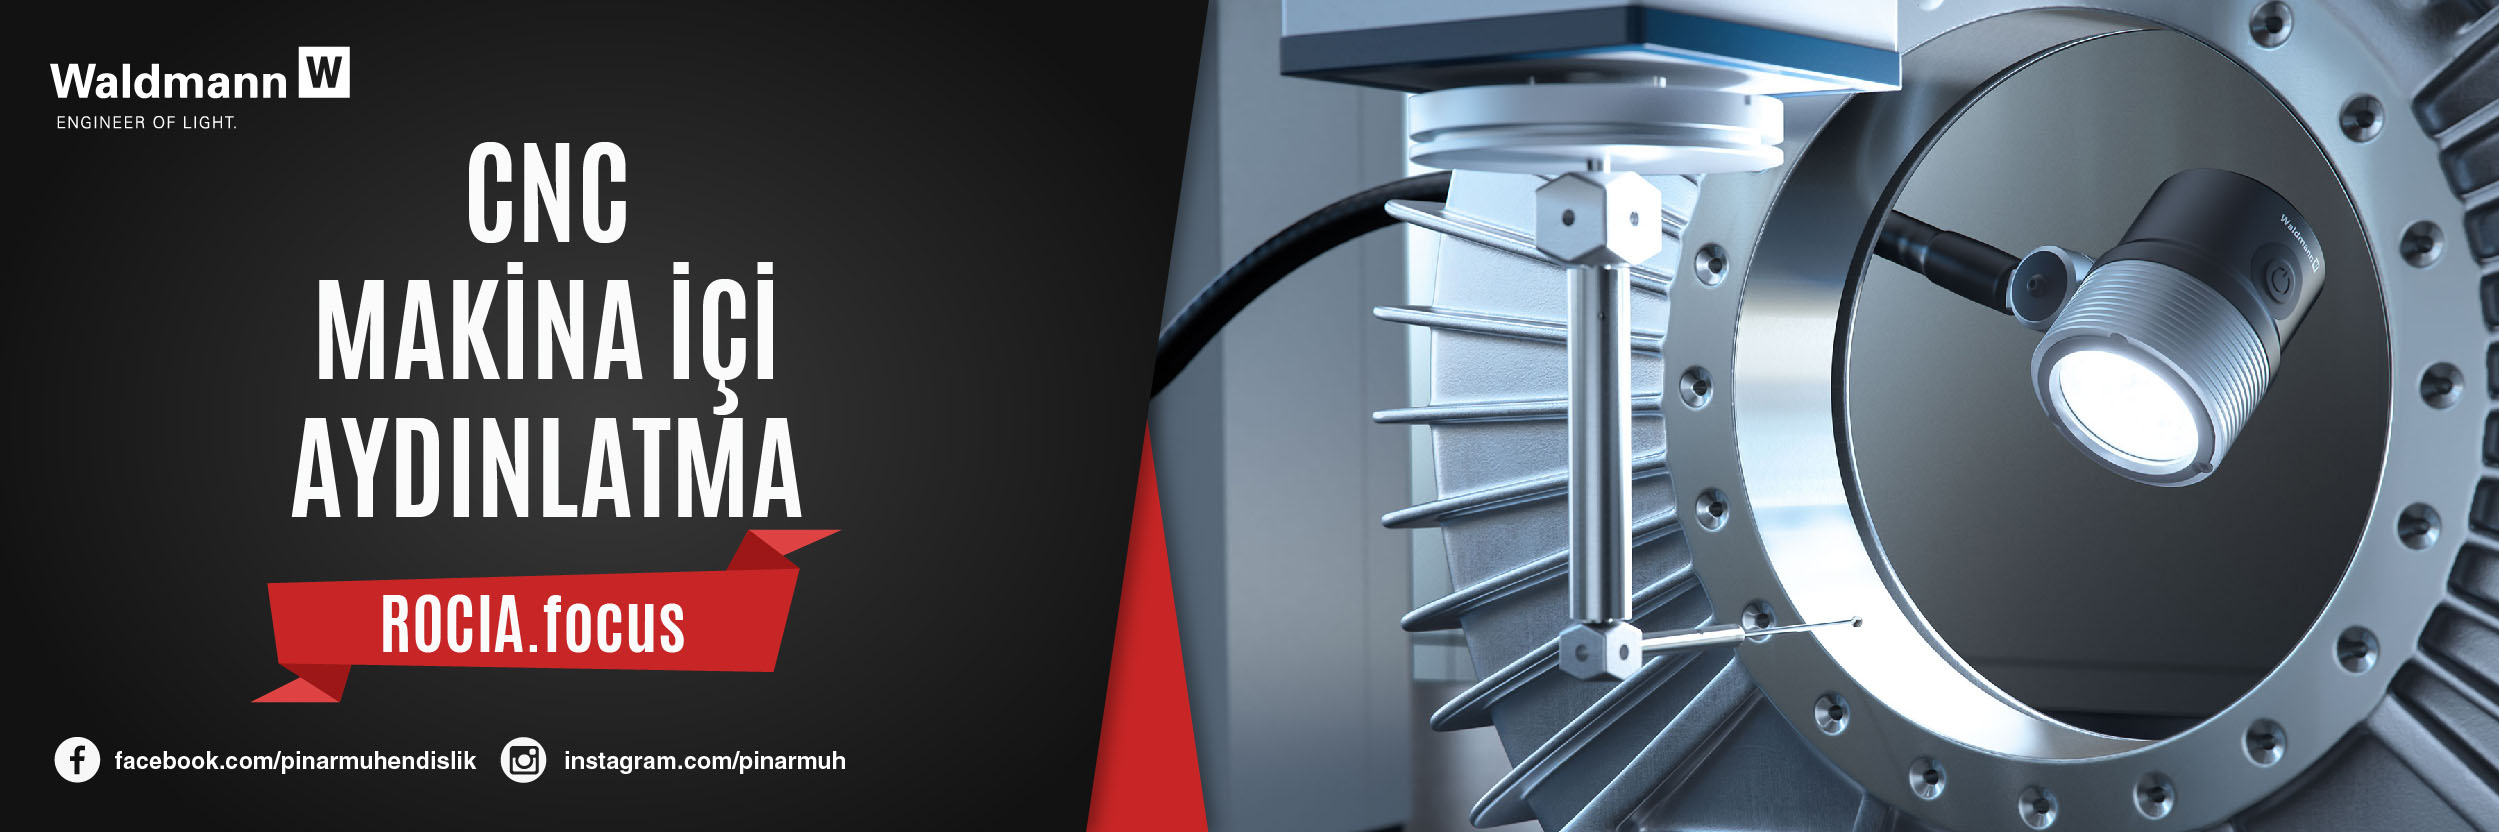 CNC Makina İçi Aydınlatma Rocia.Focus